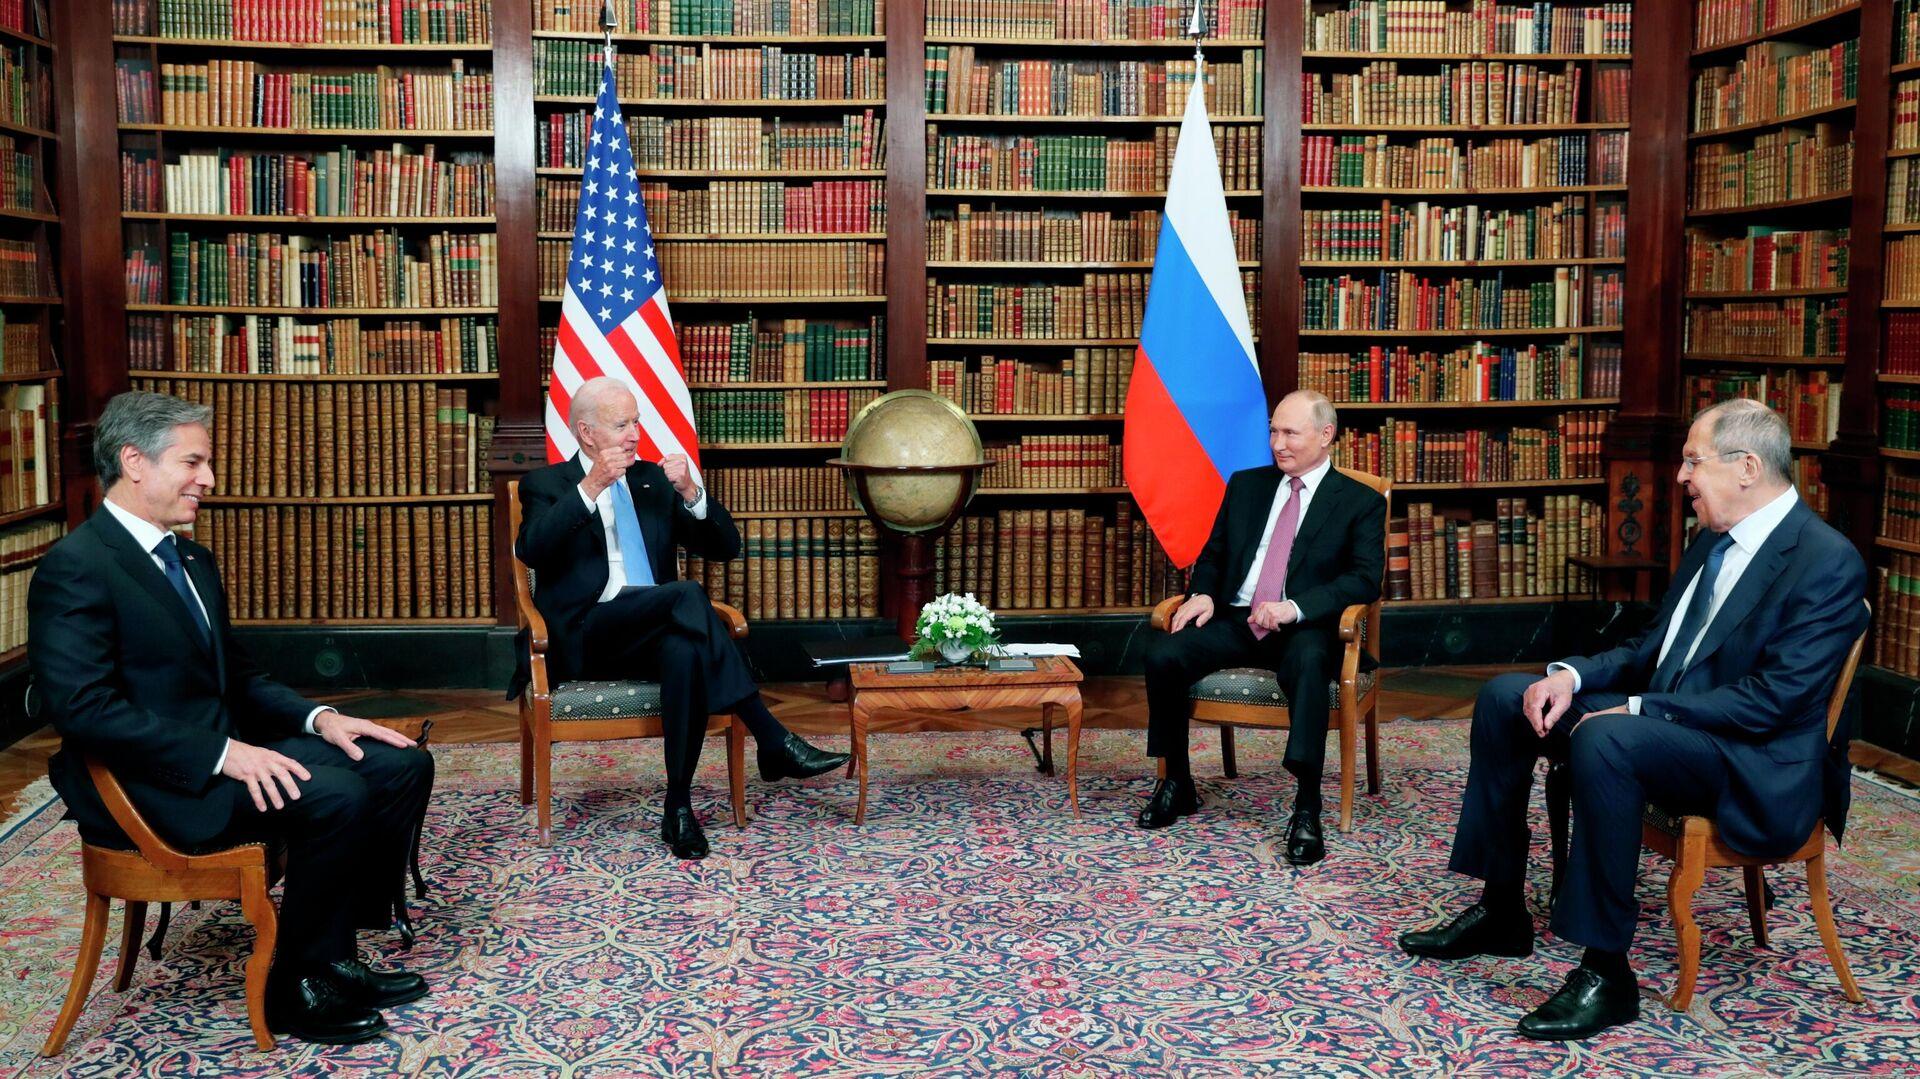 Президент РФ Владимир Путин и президент США Джо Байден во время встречи в Женеве на вилле Ла Гранж - РИА Новости, 1920, 29.06.2021